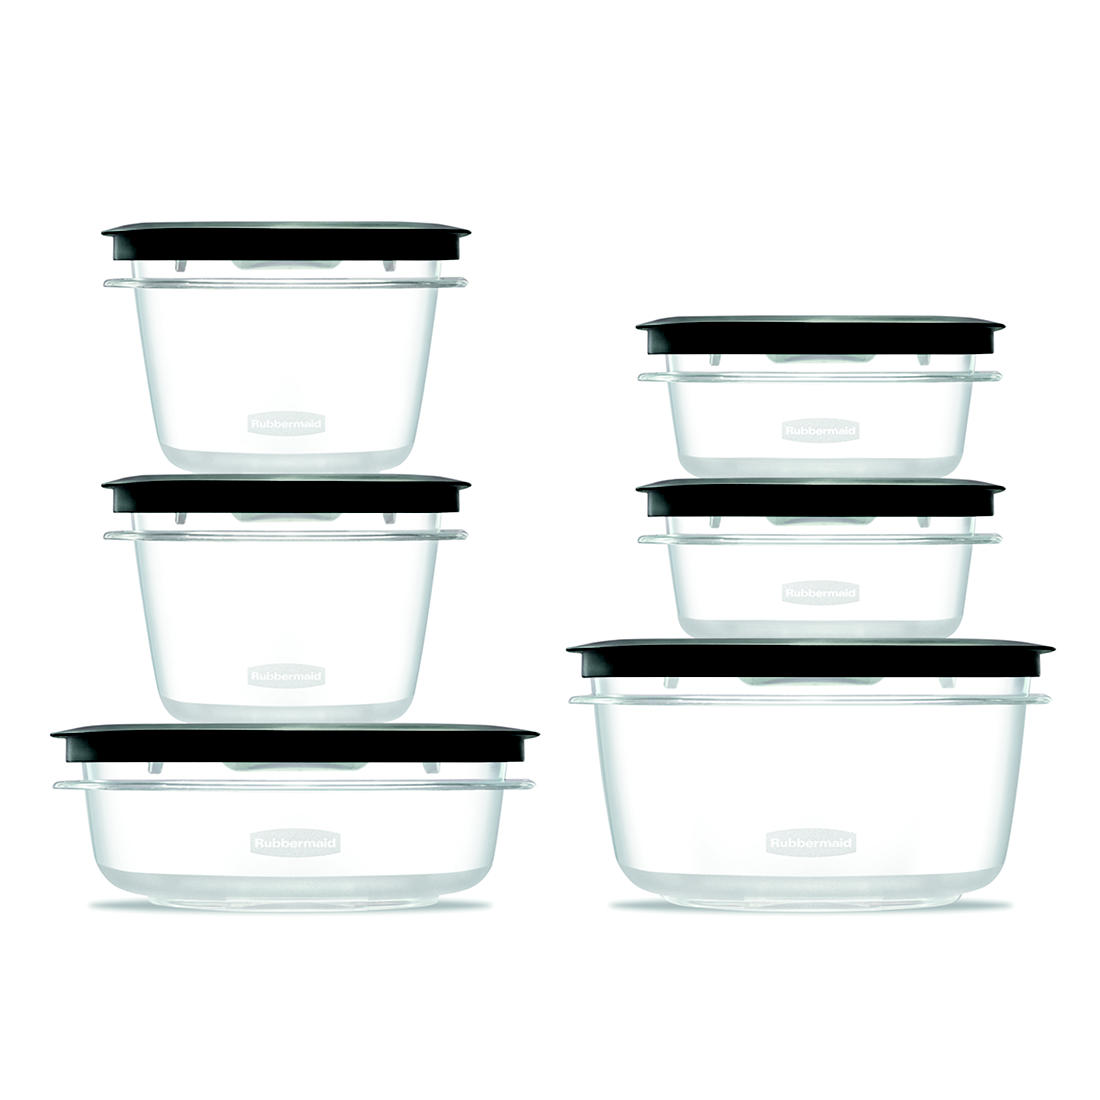 Rubbermaid Premier 12-Pc. Food Storage Container Set